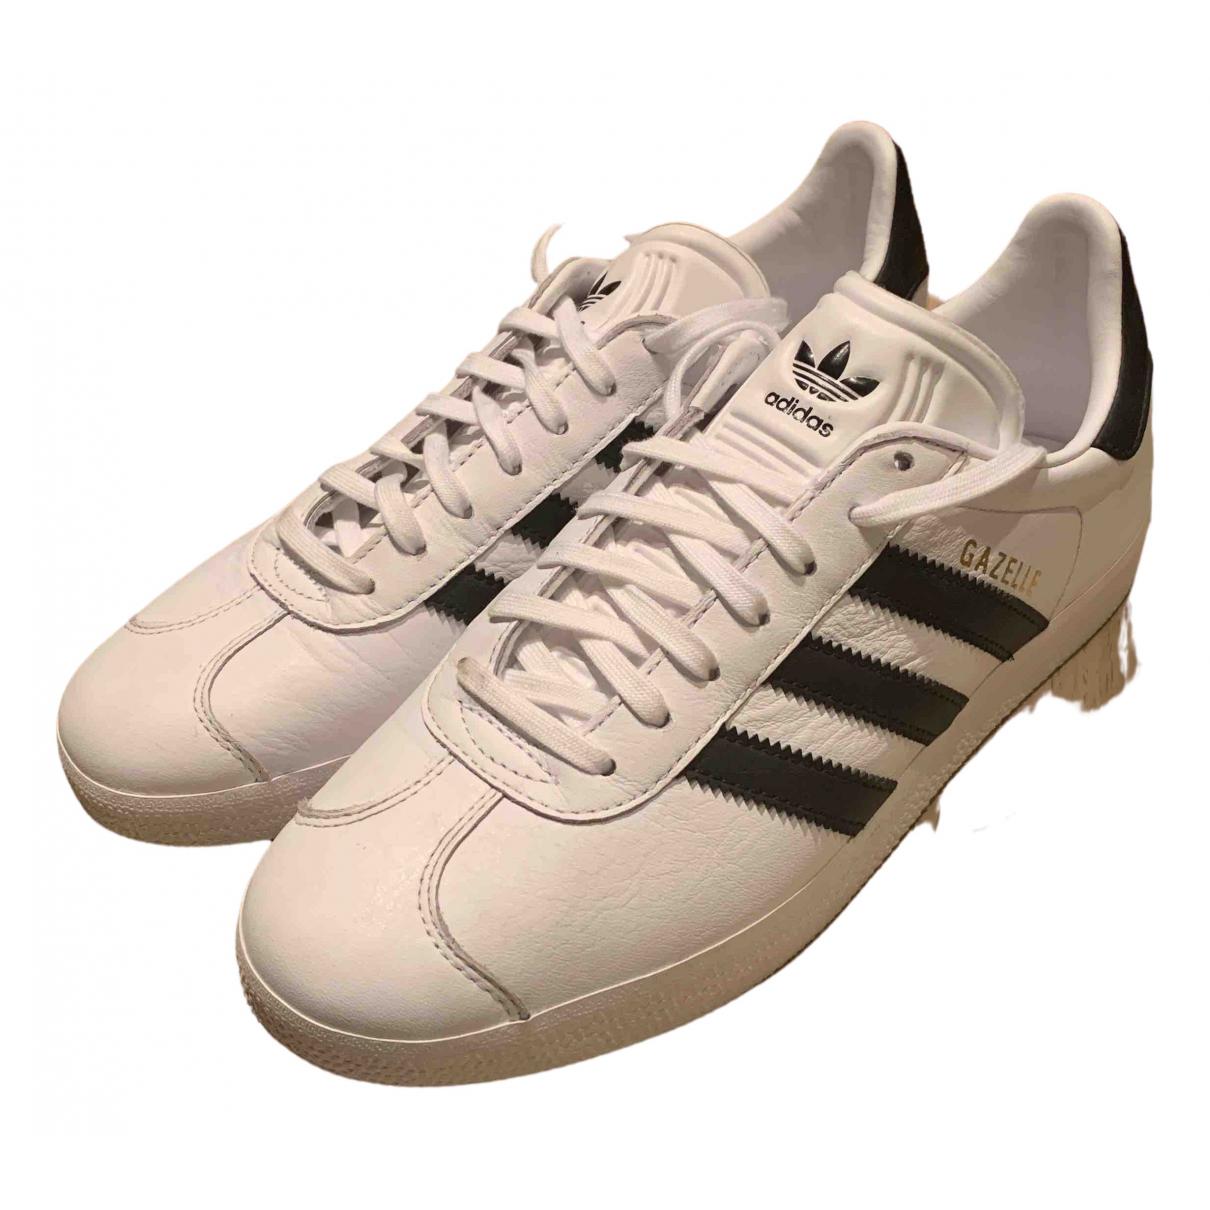 Adidas - Baskets Gazelle pour femme en cuir - blanc